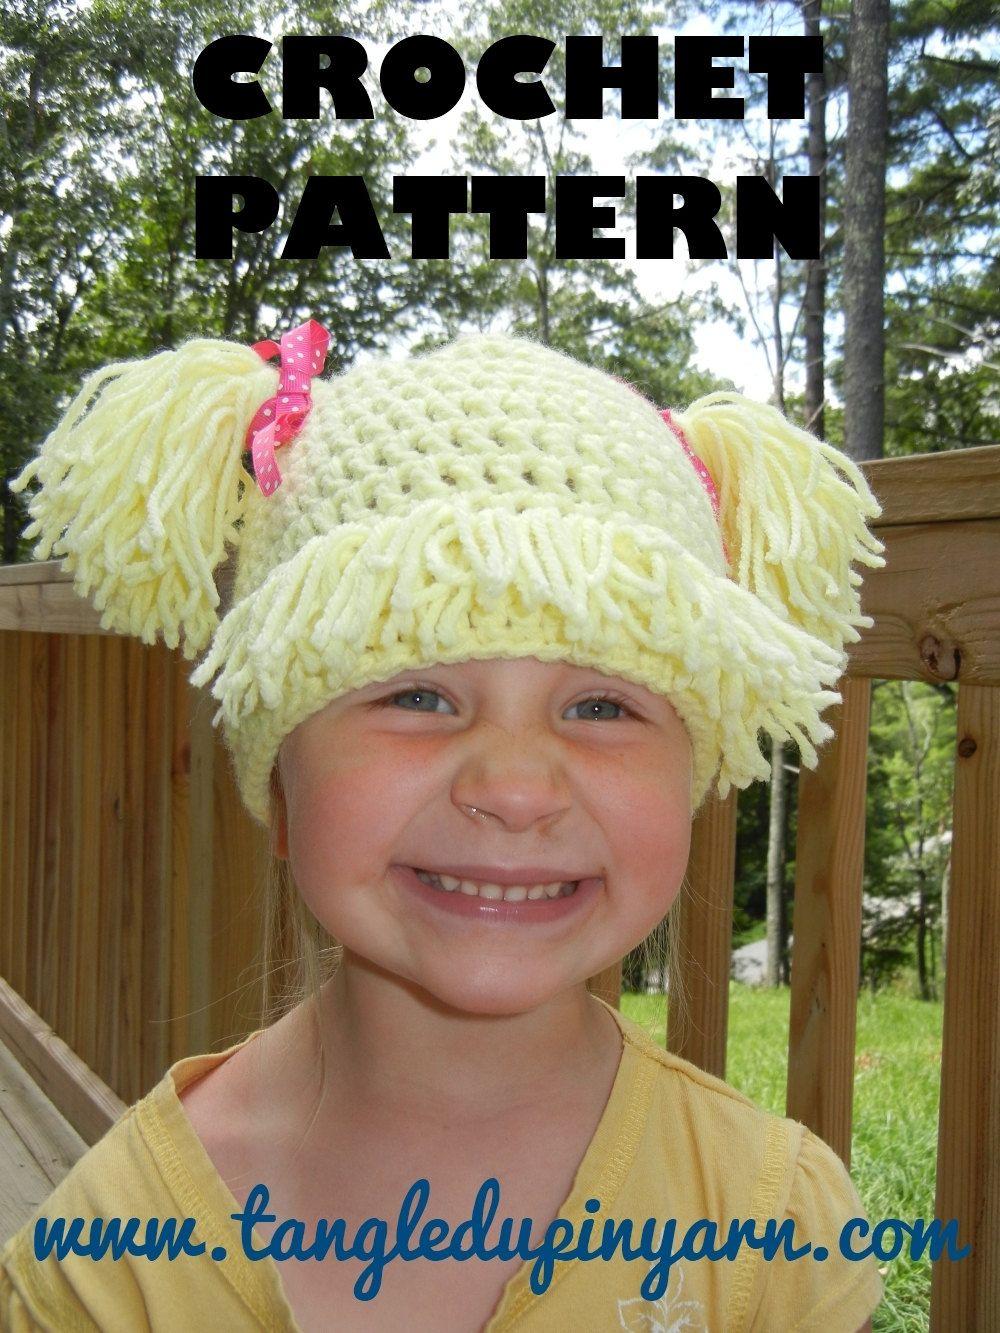 PATTERN+Newborn+to+12+months+by+TangledUpInYarn+on+Etsy,+$5.95